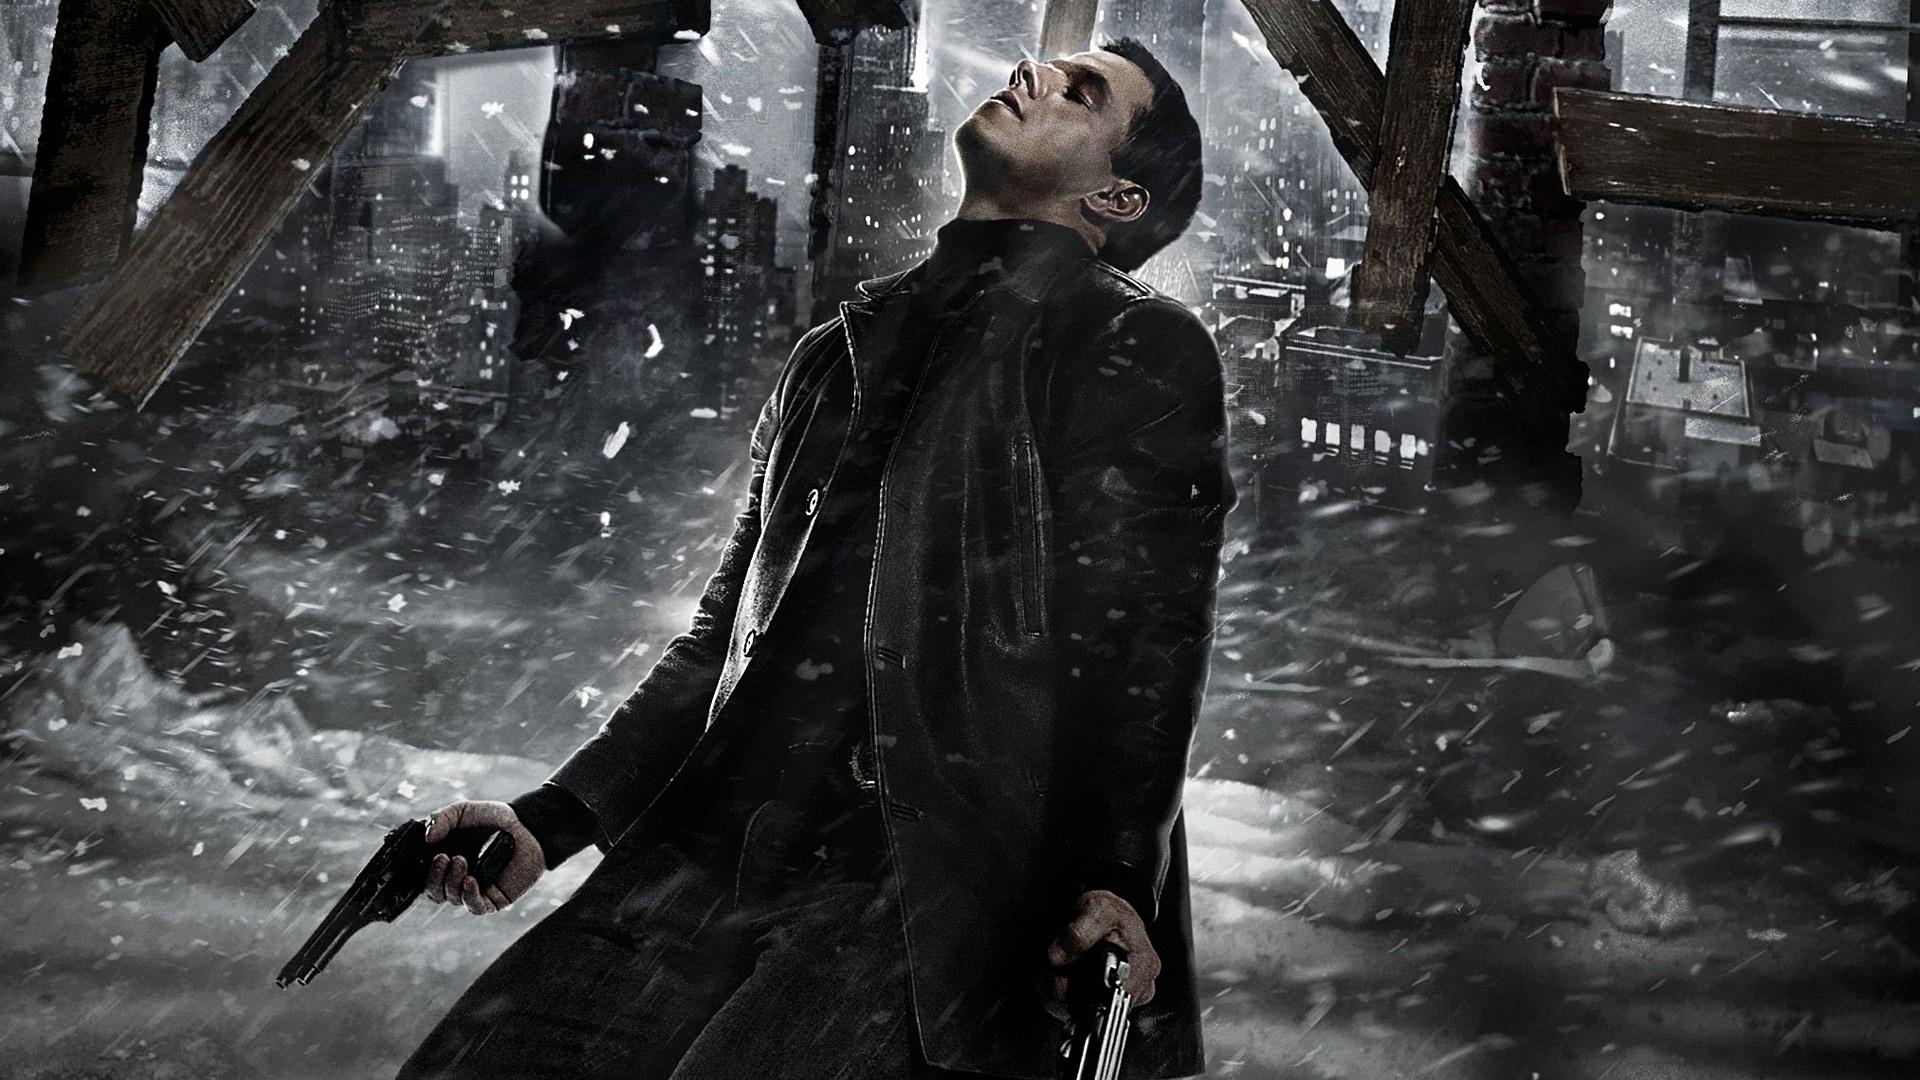 Best Wallpaper Movie Max Payne - aa9790944d3048f0647b4fed38397836  Graphic_803376.jpg